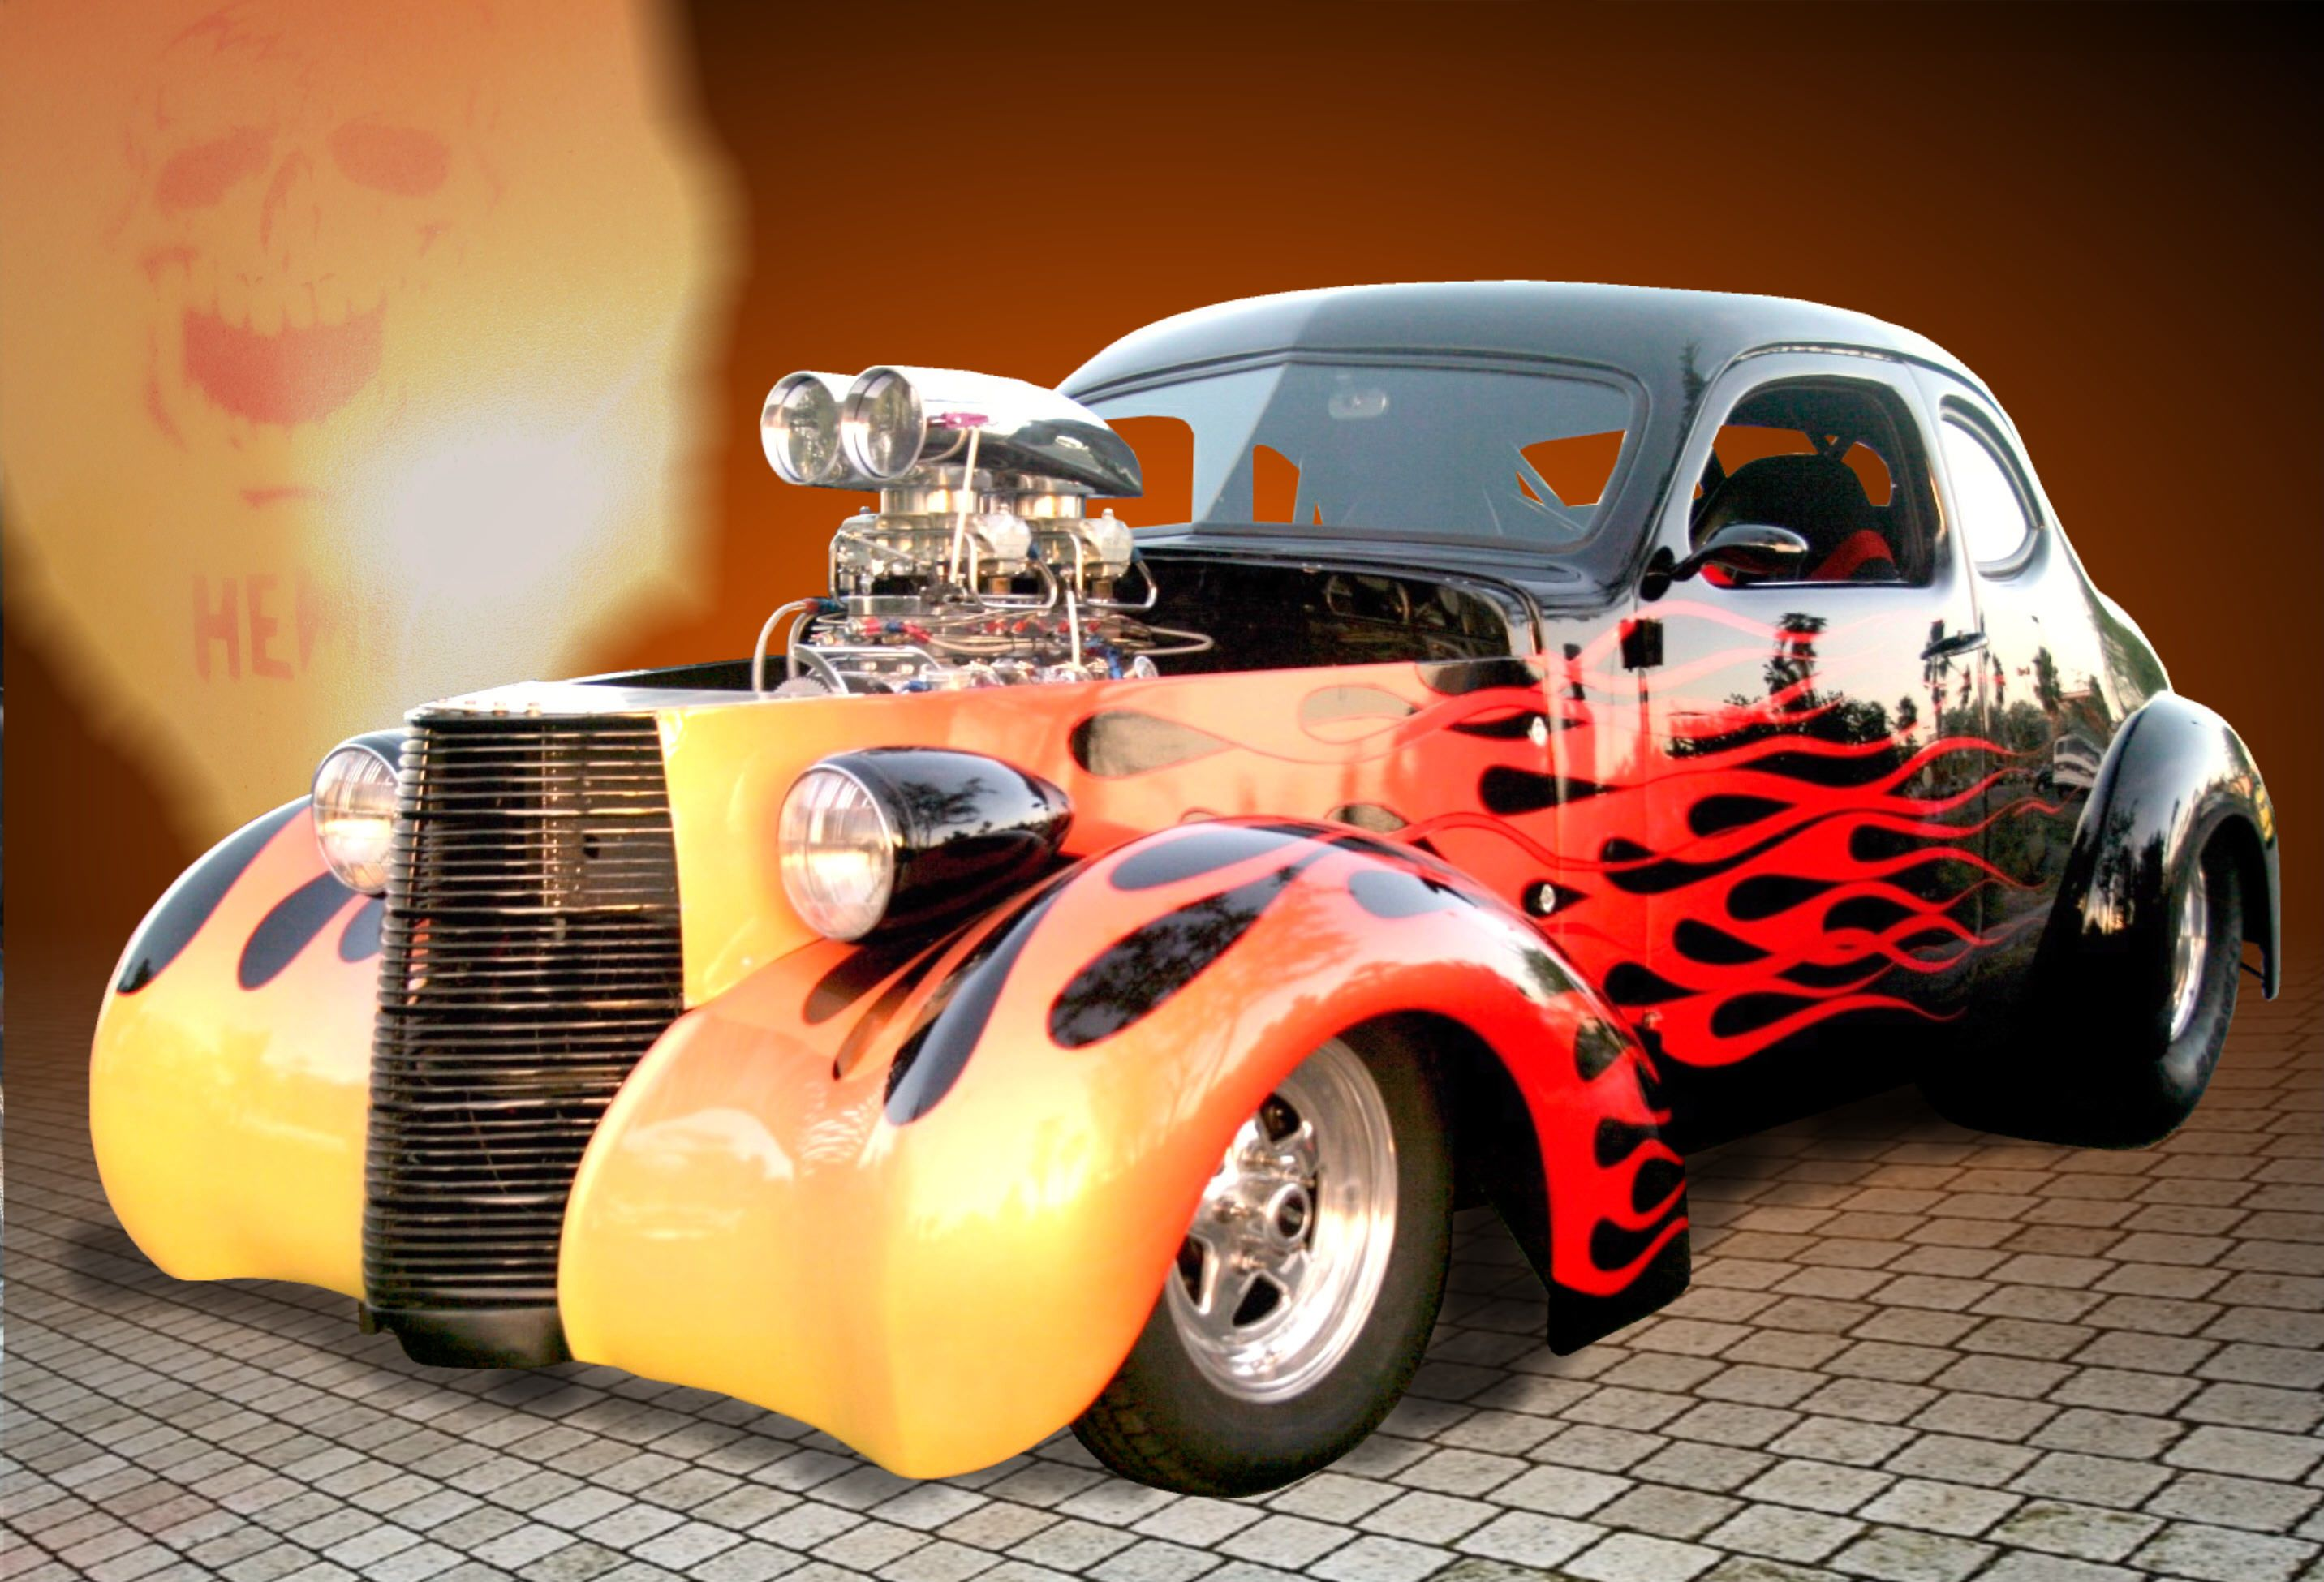 28641950 Hot rods Hot rods cars muscle Hot rods cars 2864x1950